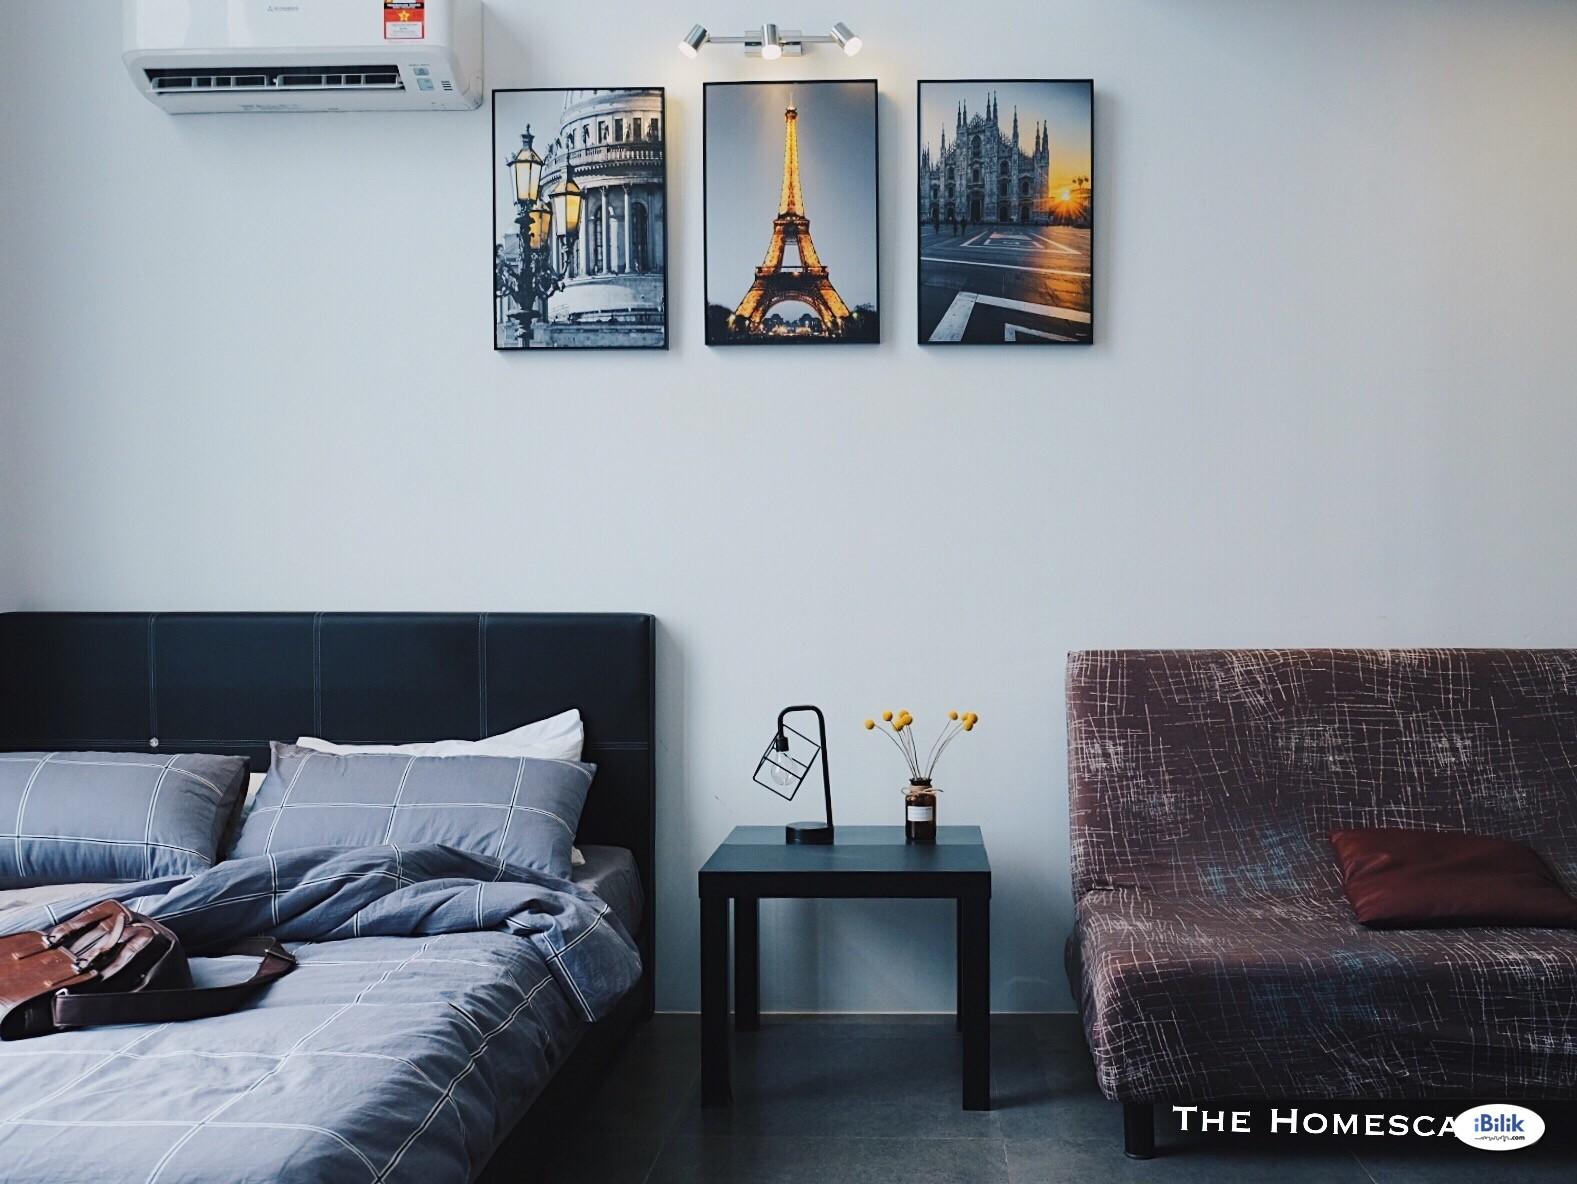 ♞The Homescape♞ 2-5 Pax Comfy Home 5min drive to IKEA/Curve/Kidzania